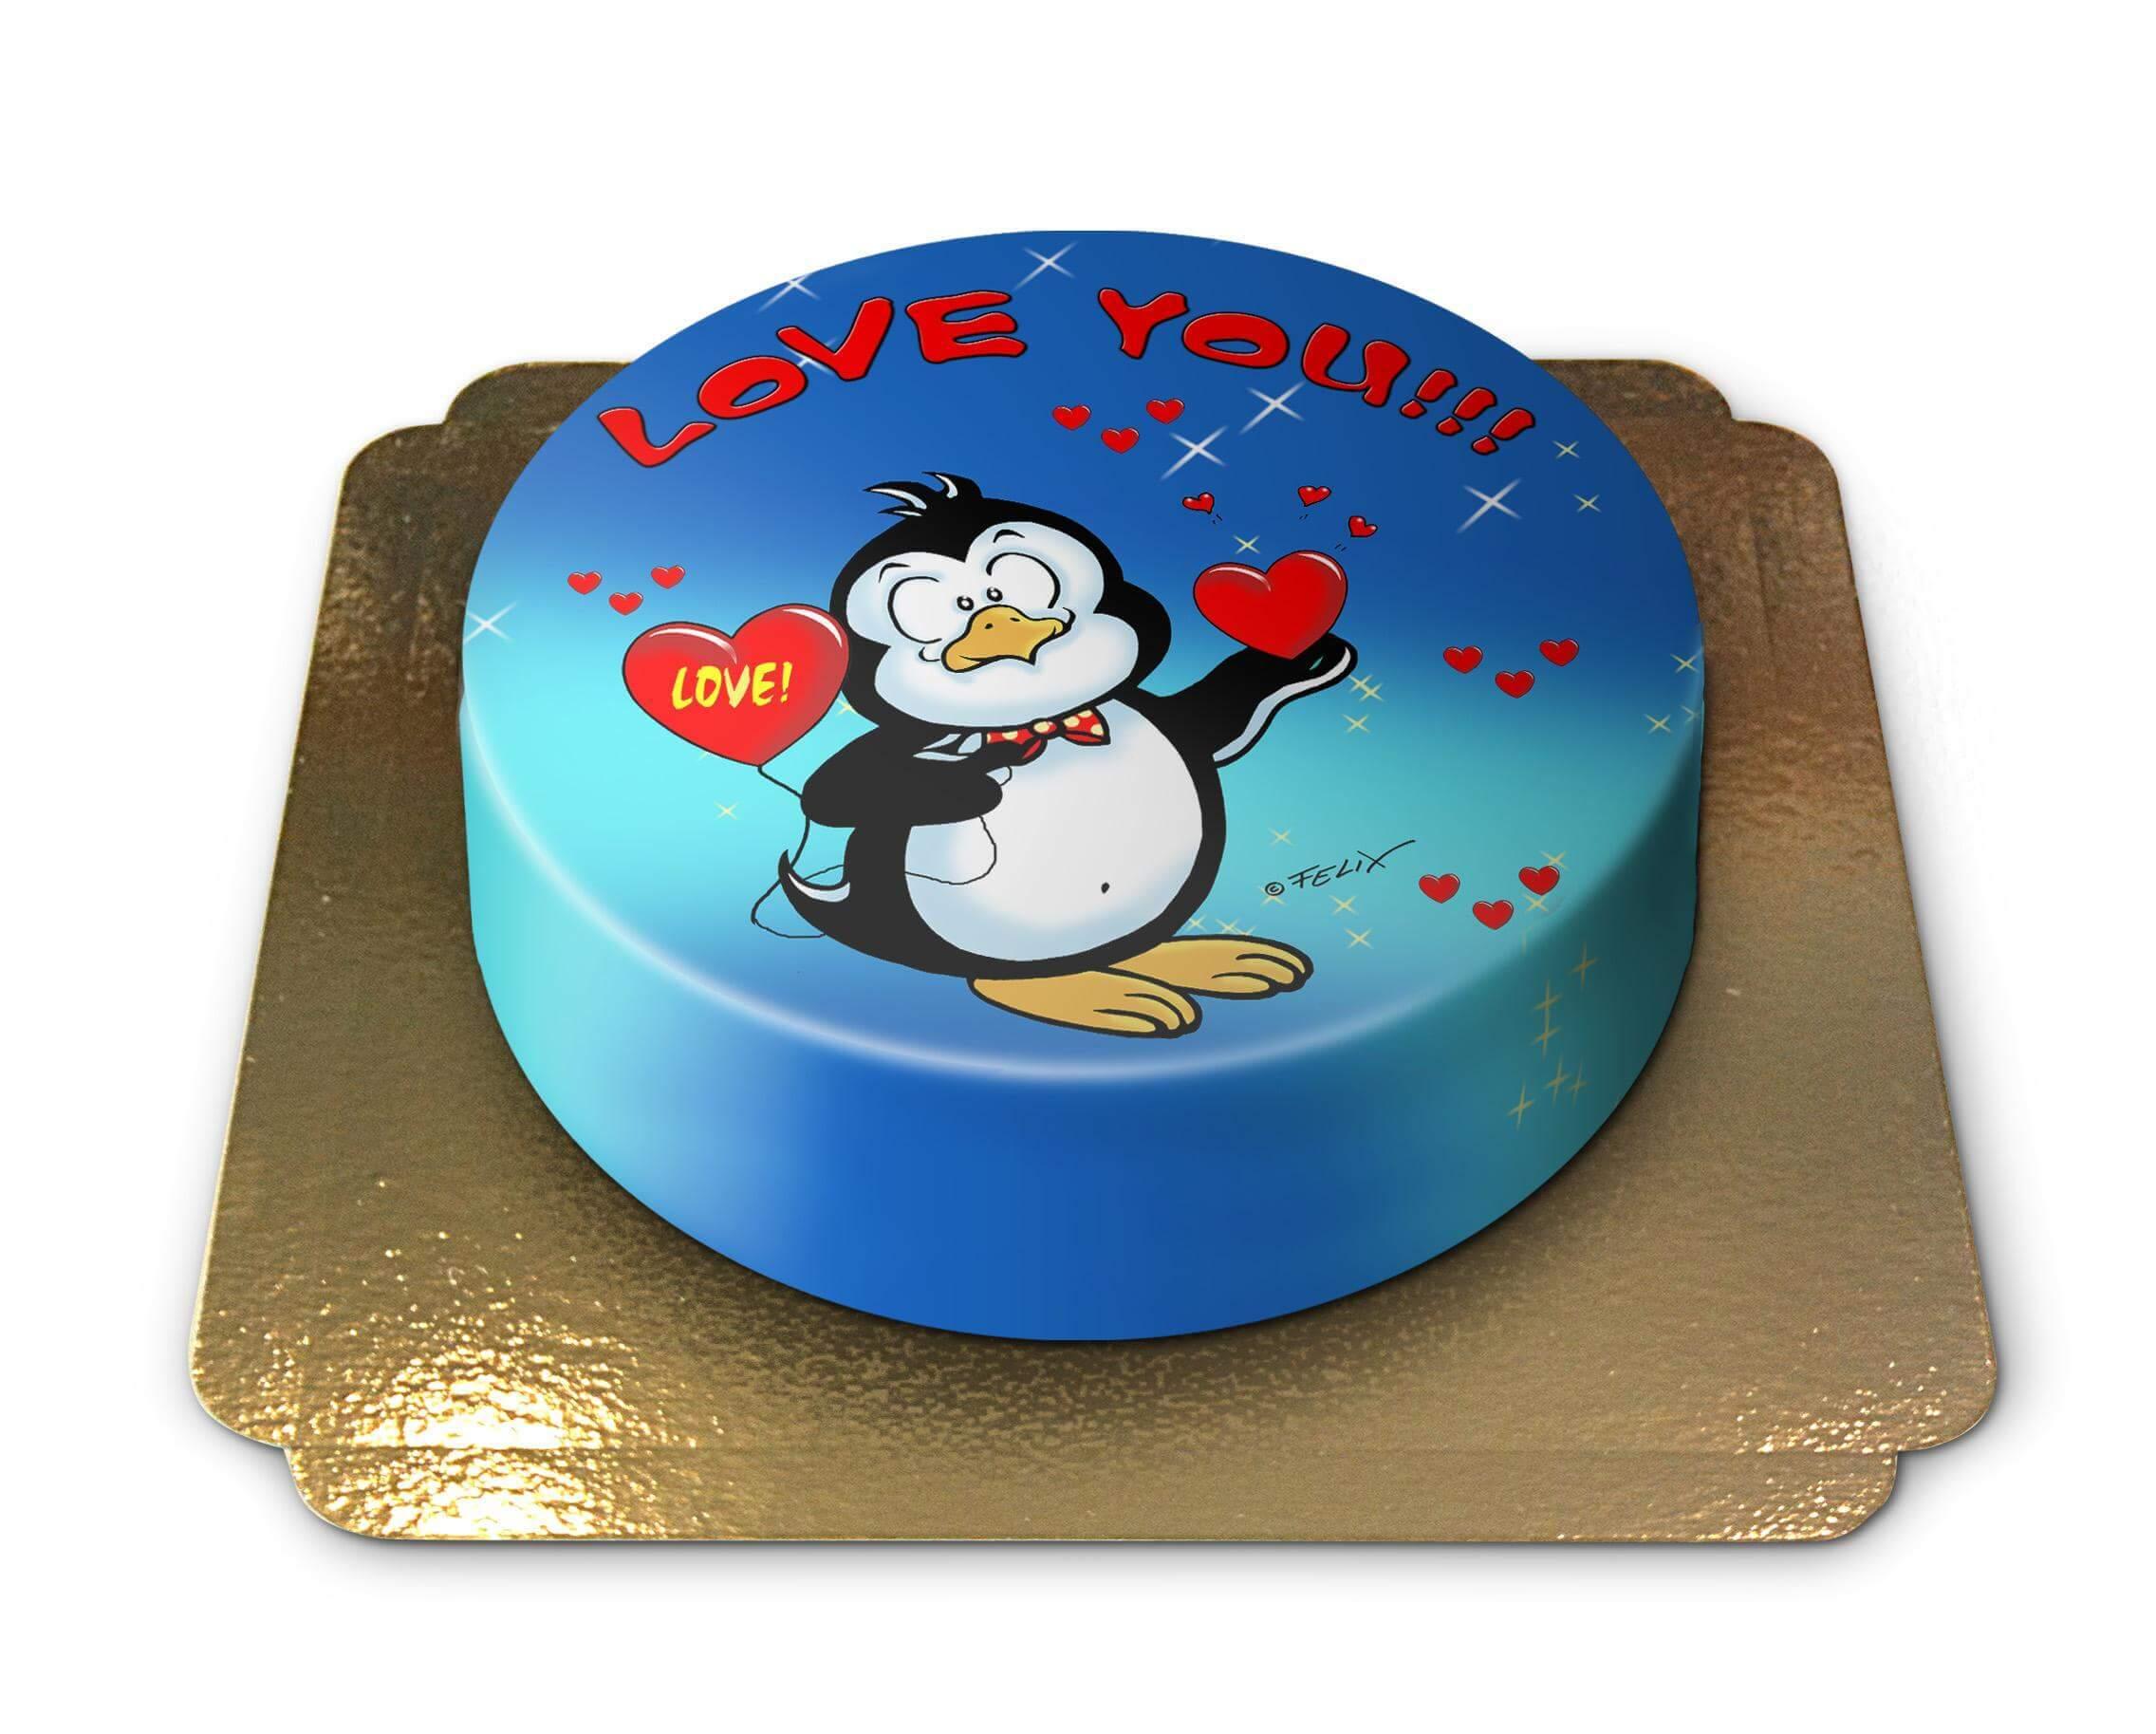 Love you Torte